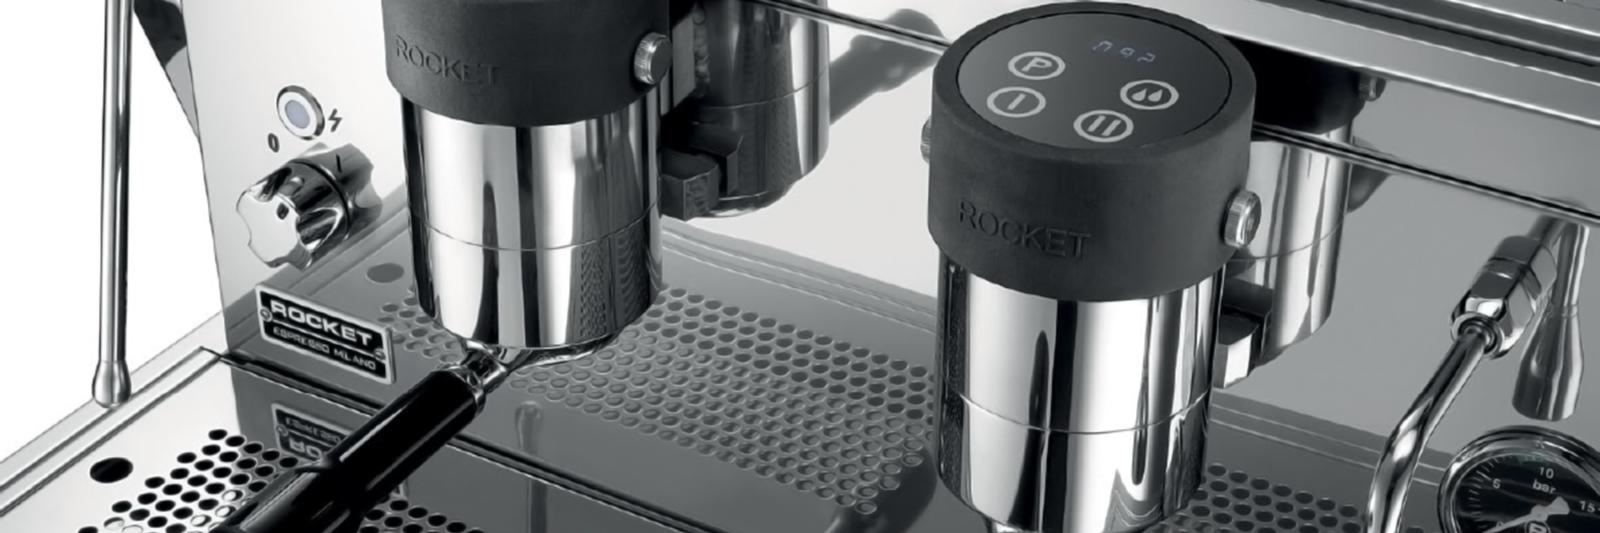 Kaffeemaschine Rocket